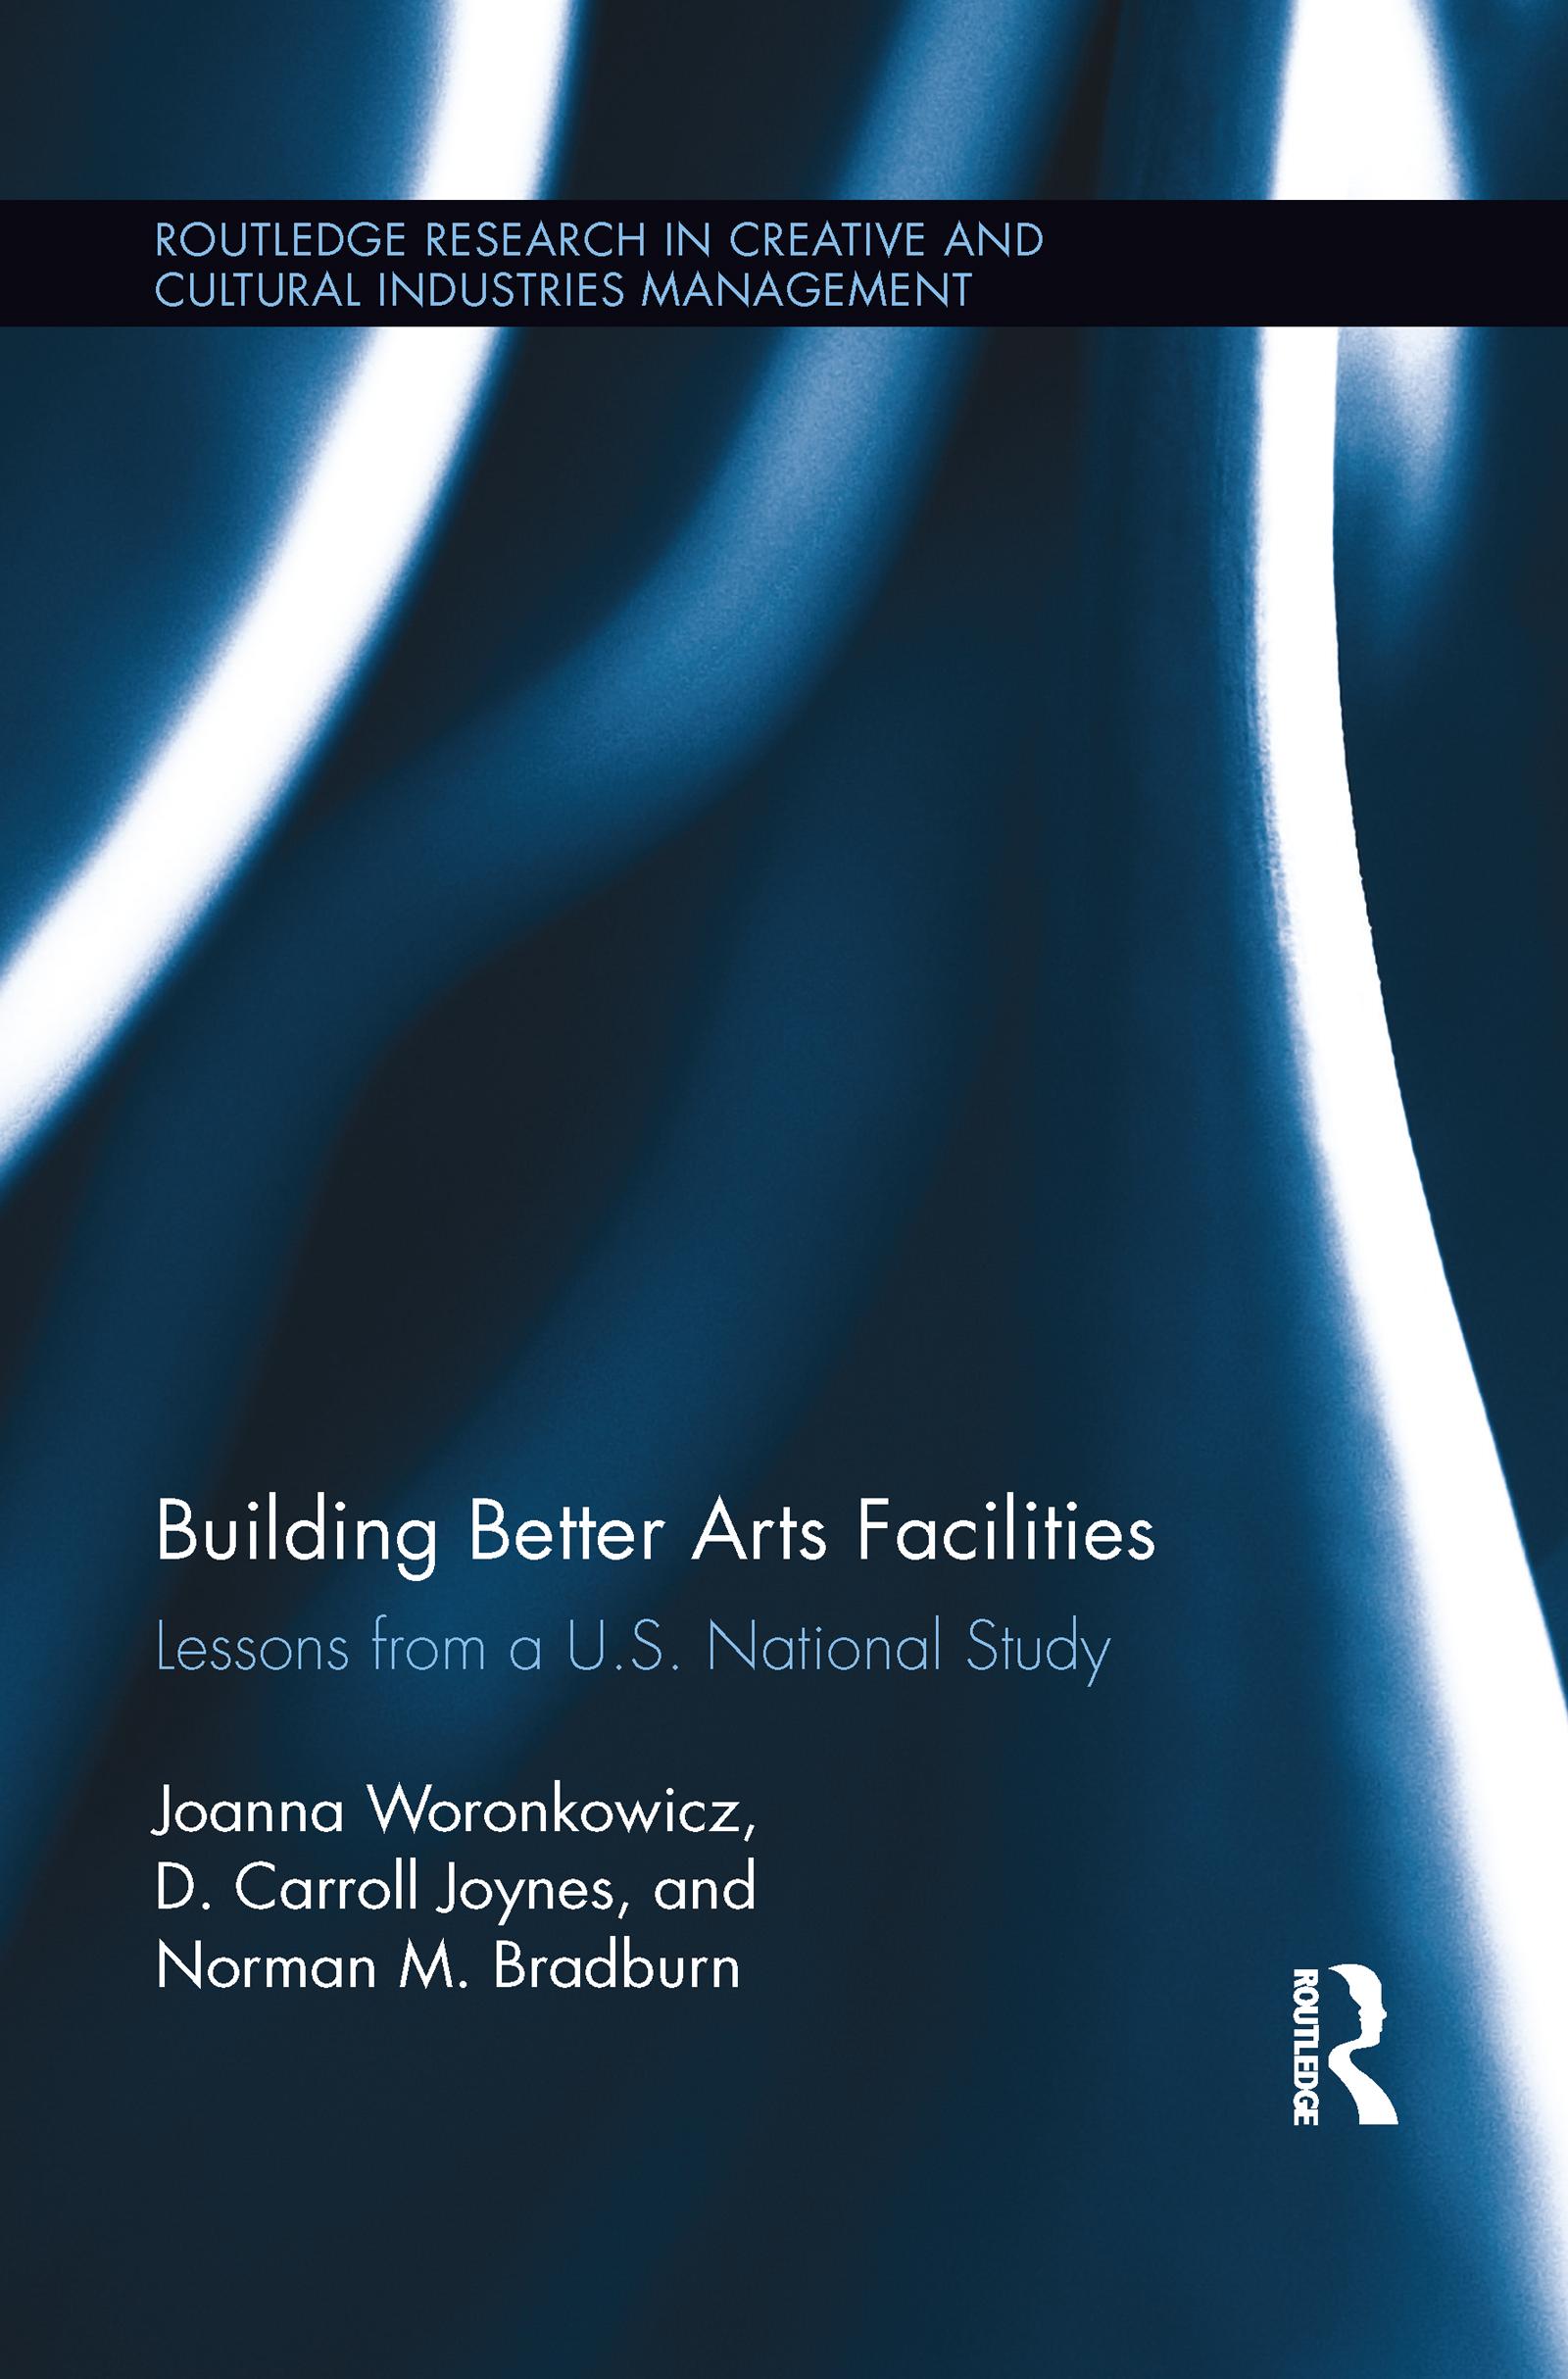 Building Better Arts Facilities